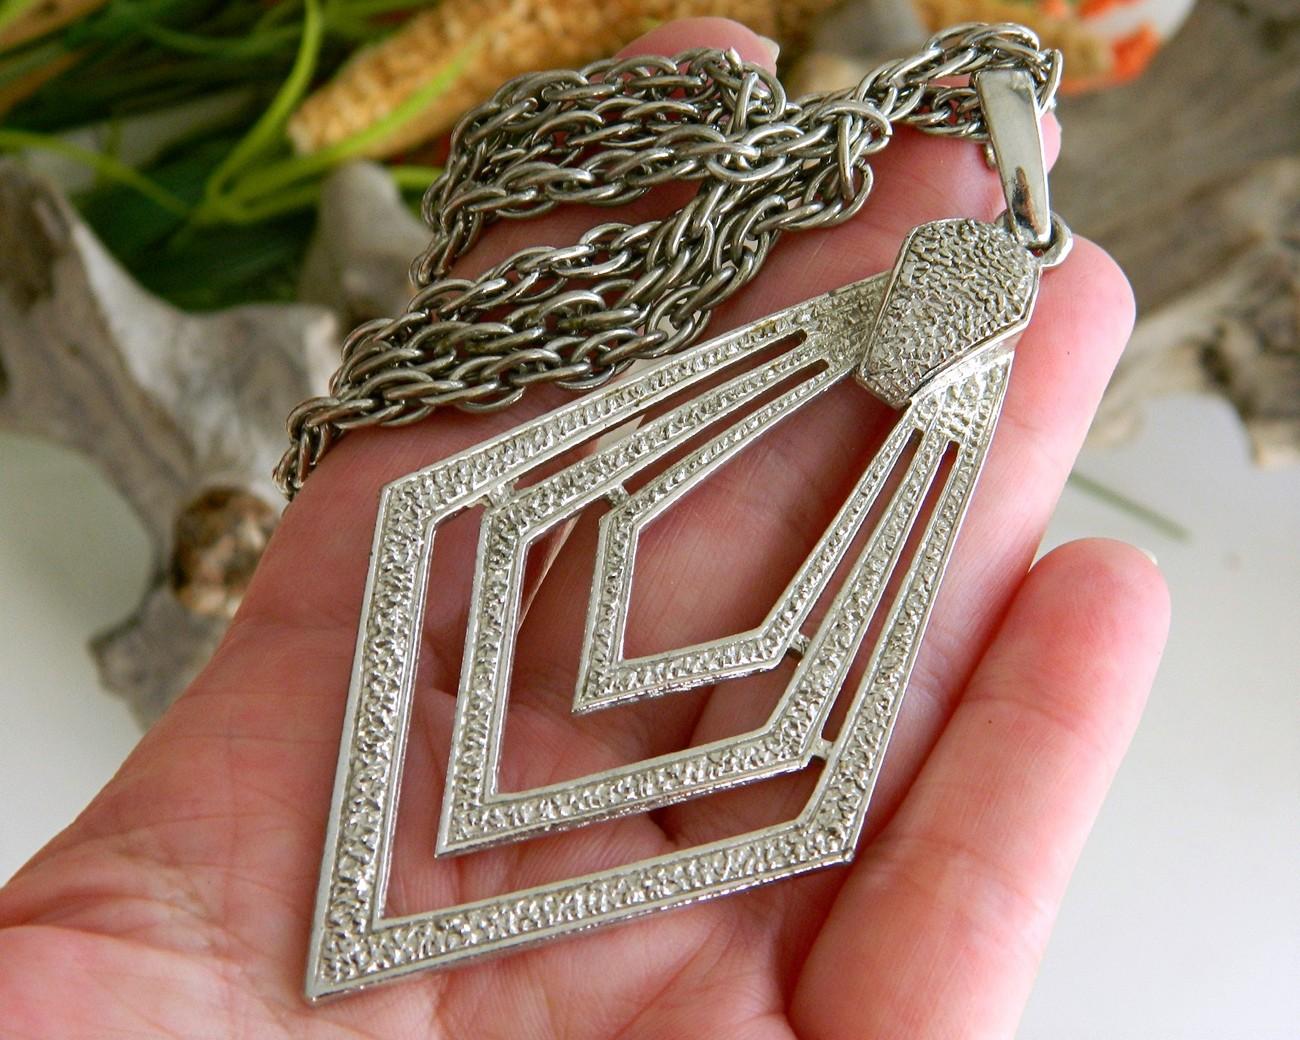 Vintage Diamond Shaped Pendant Necklace Geometric Concentric